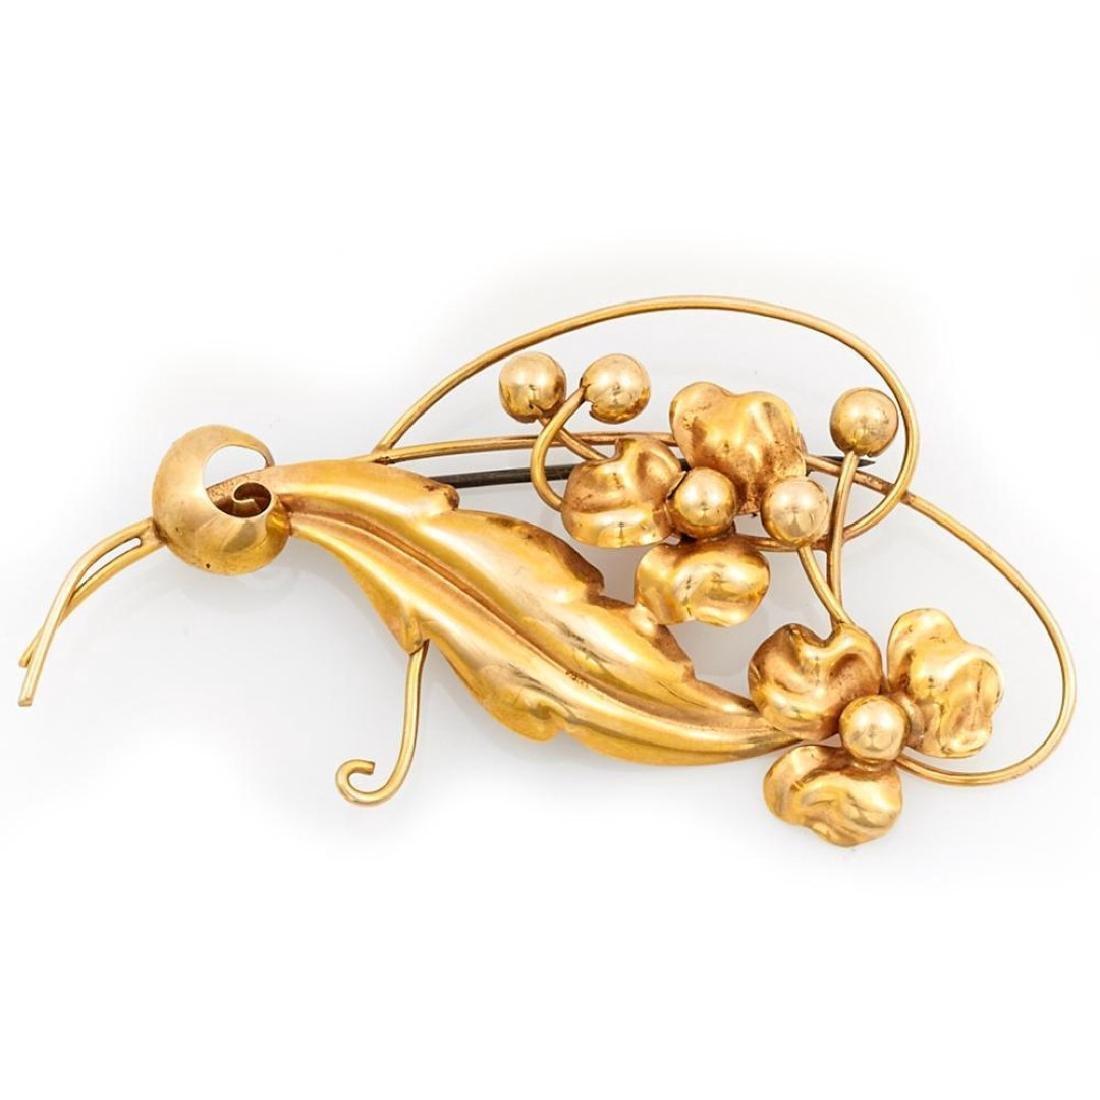 Retro 10k gold floral brooch, Rogel